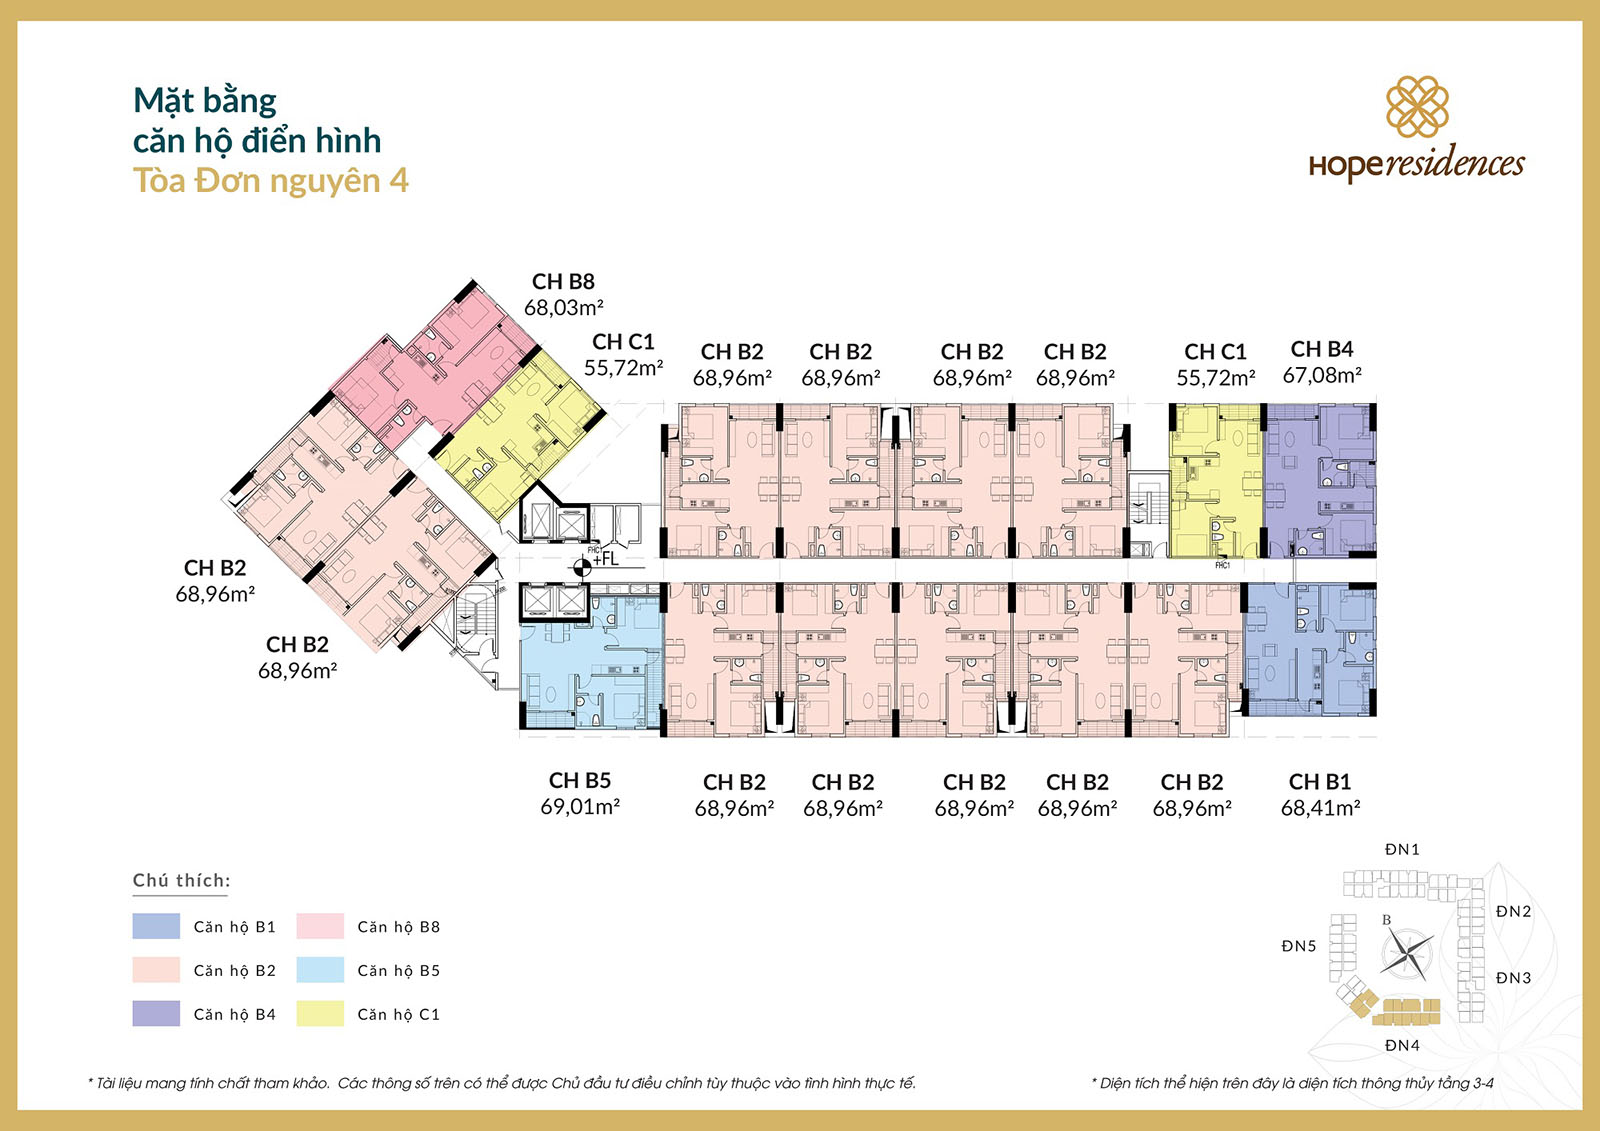 mat-bang-thiet-ke-don-nguyen-4-hope-residences